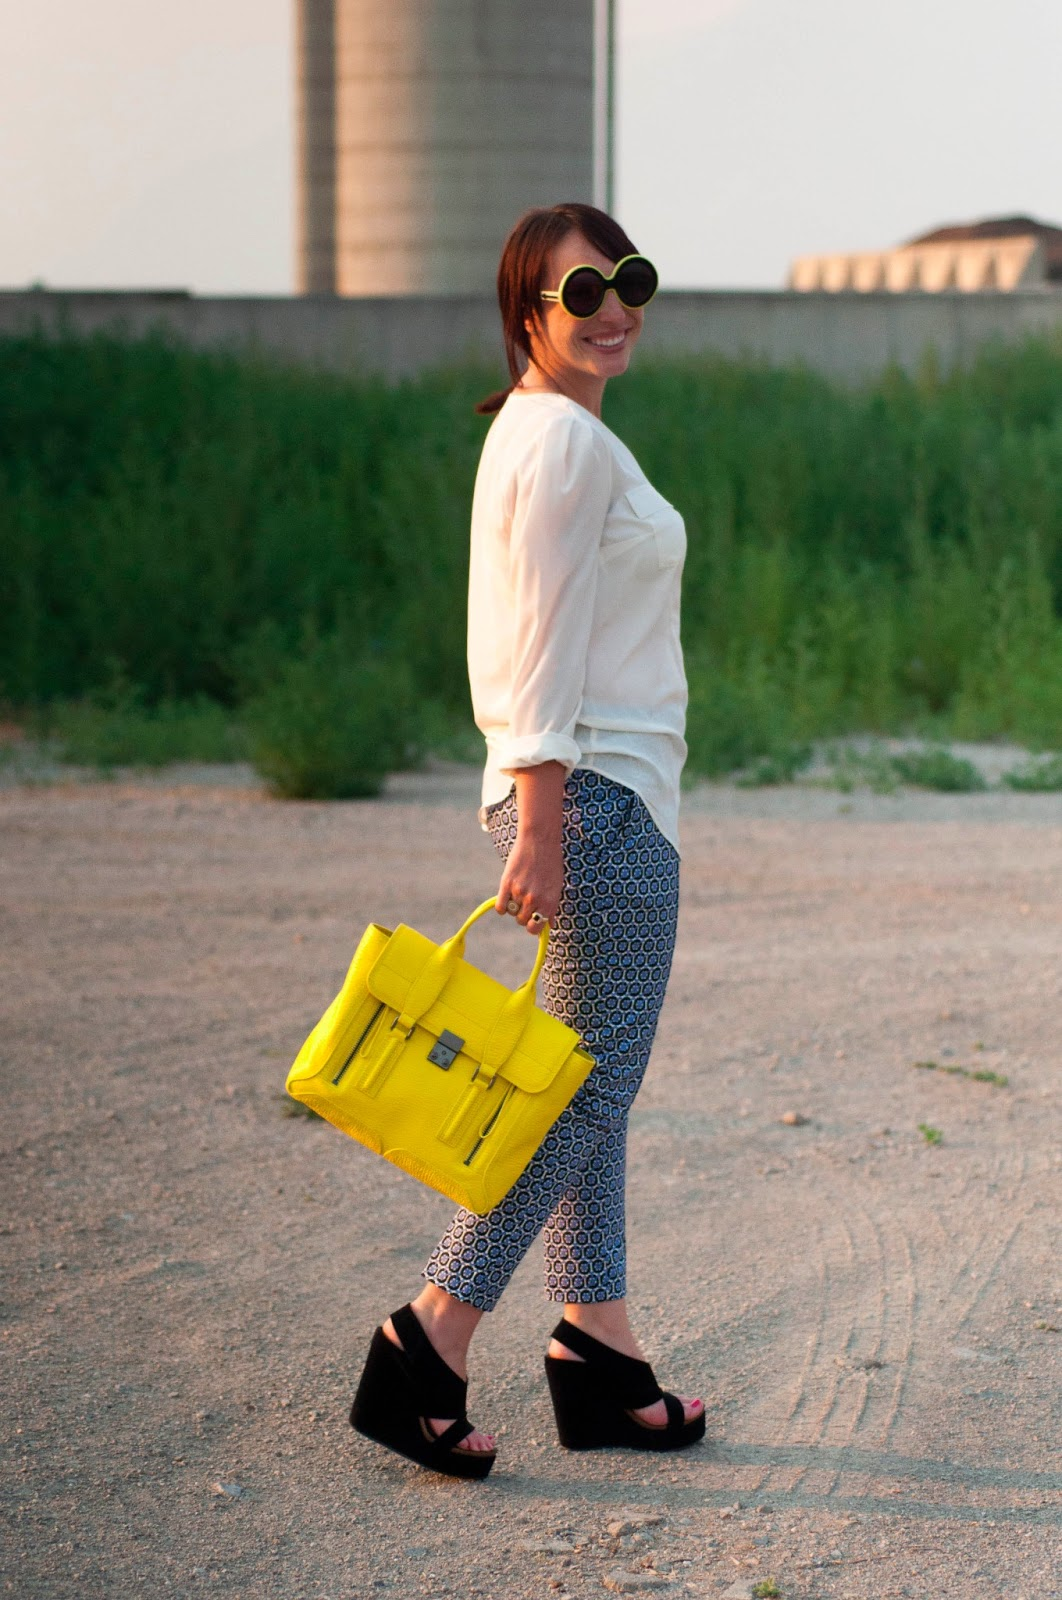 fashion blog, style blog, ootd, what I wore, phillip lim, 3.1 phillip lim pashli satchel, yellow handbag, target style